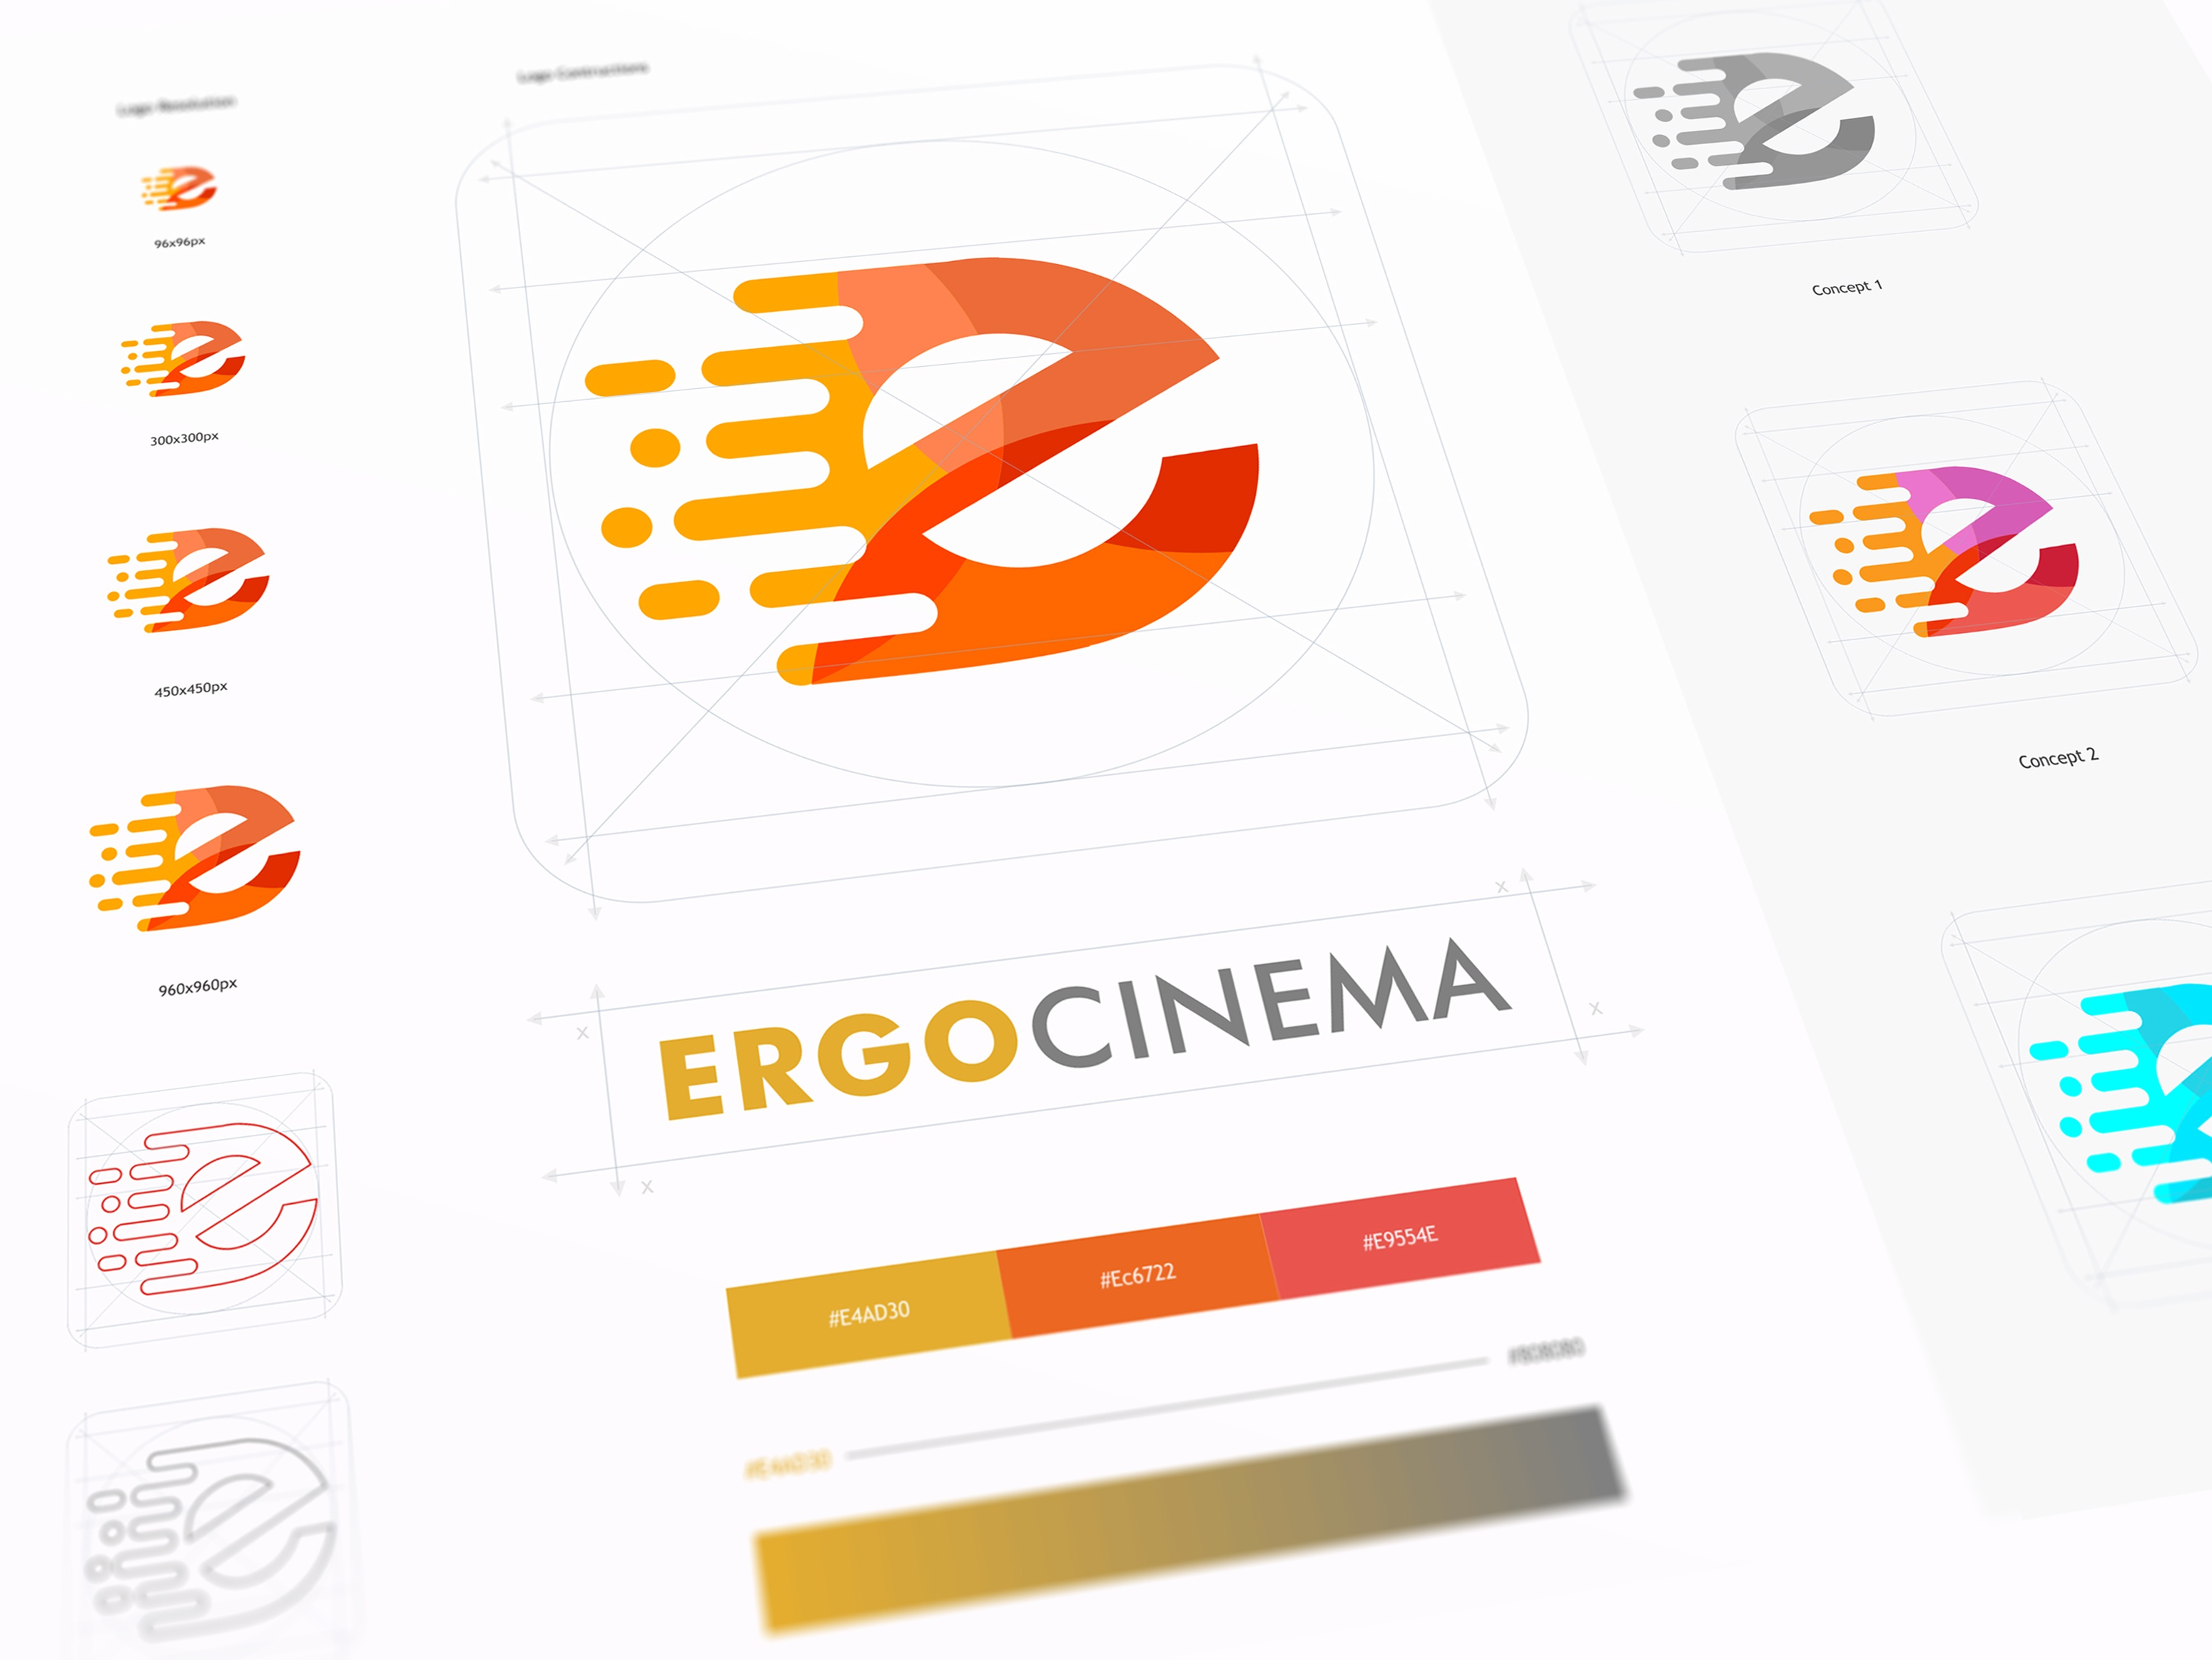 Ergocinemas